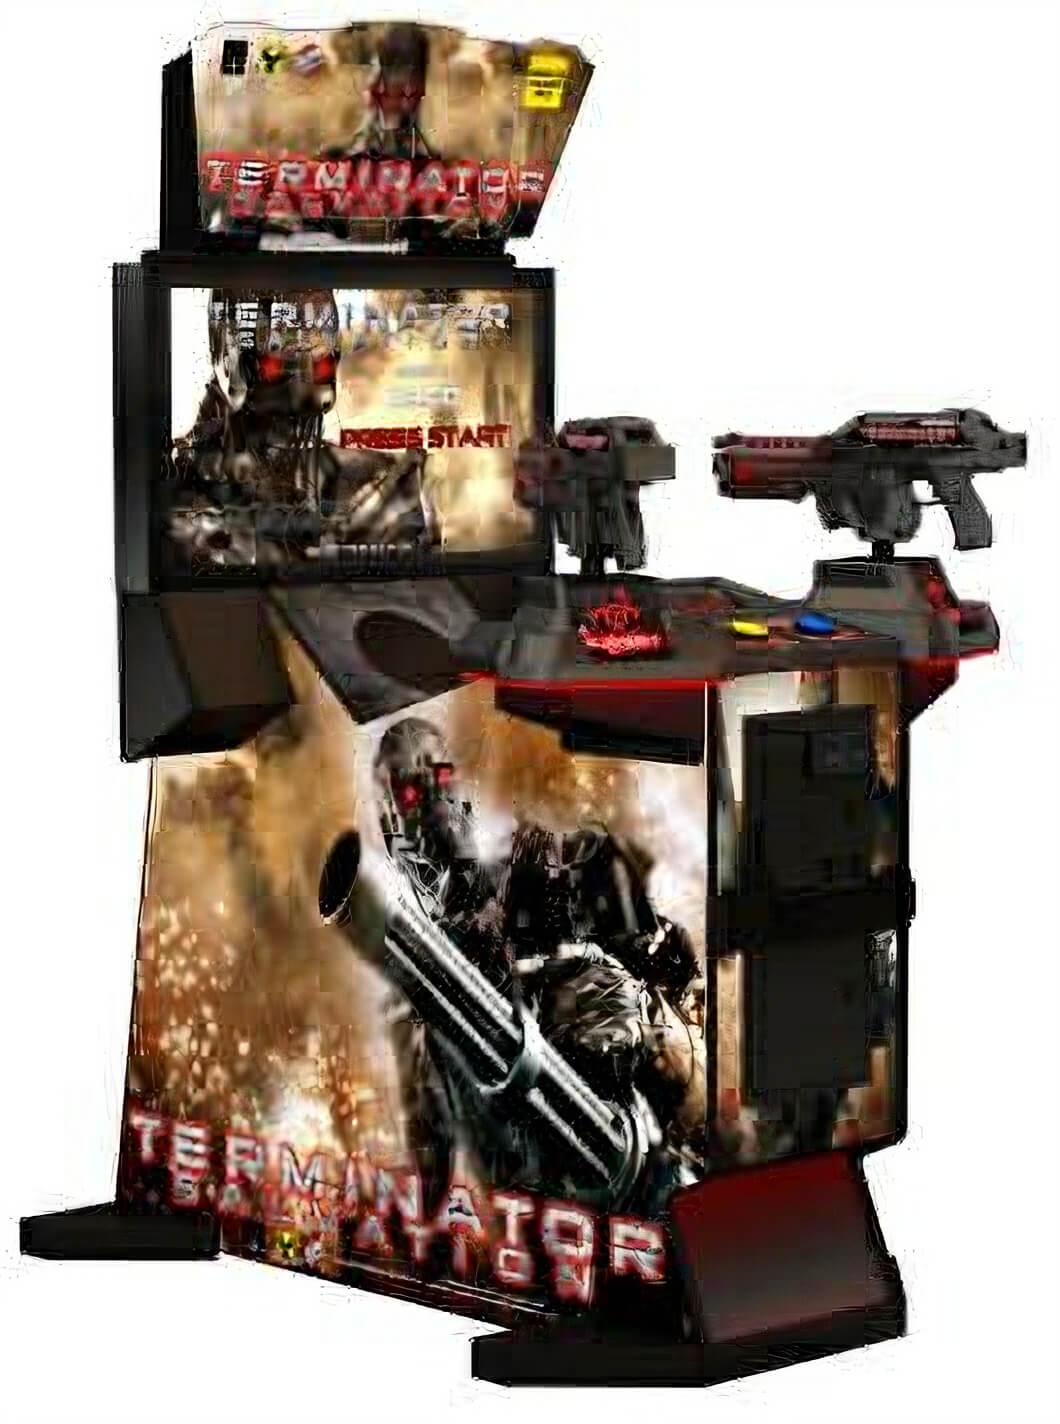 Raw Thrills Terminator Salvation Arcade Machine Liberty